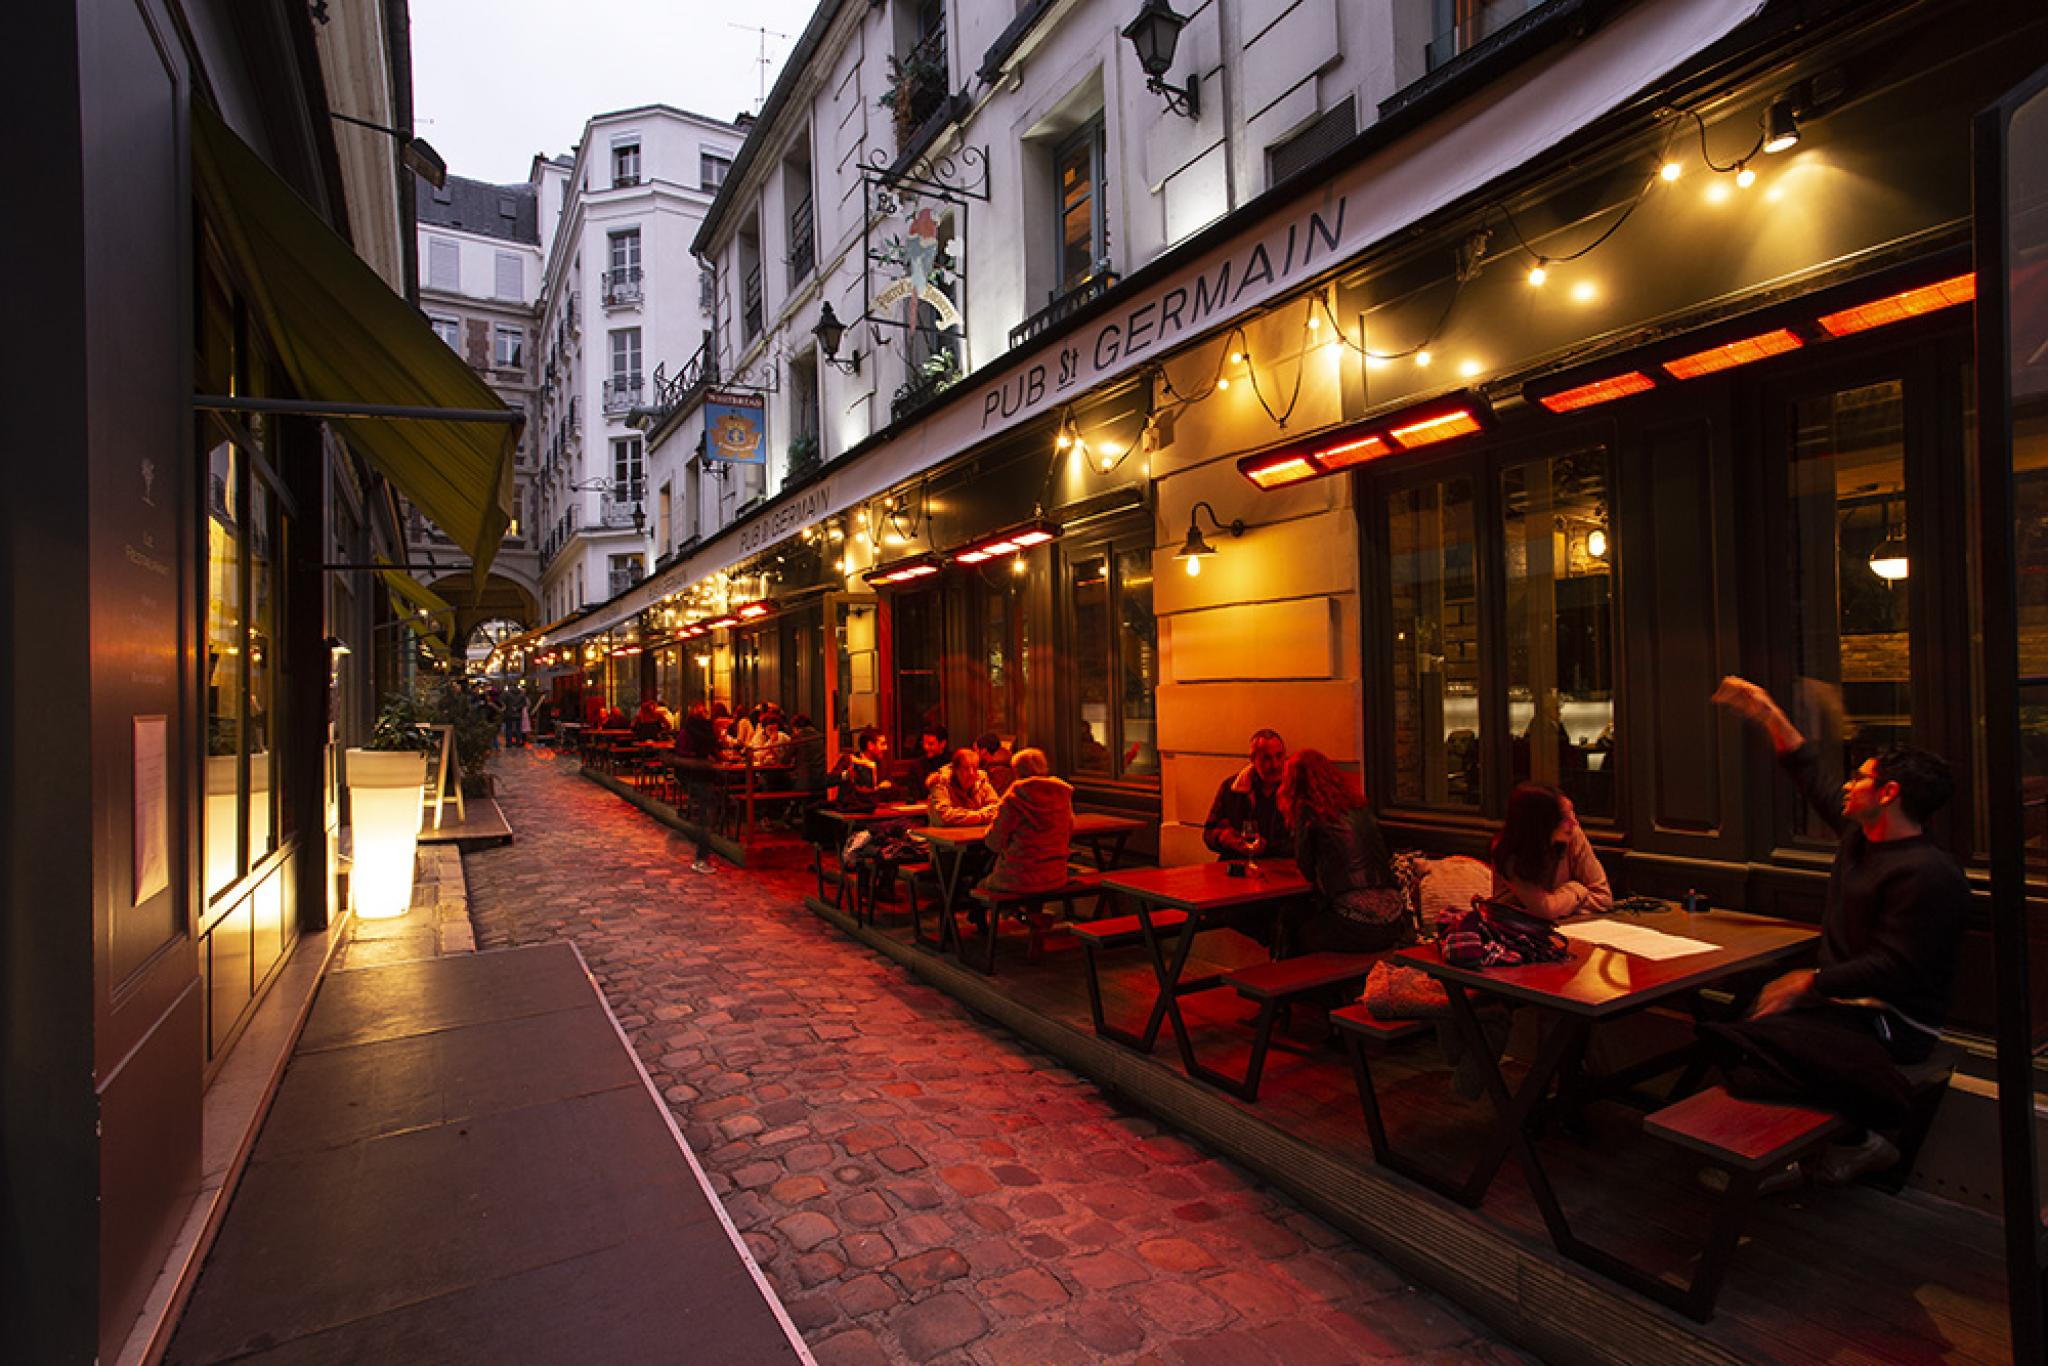 terrasse-pub-st-germain